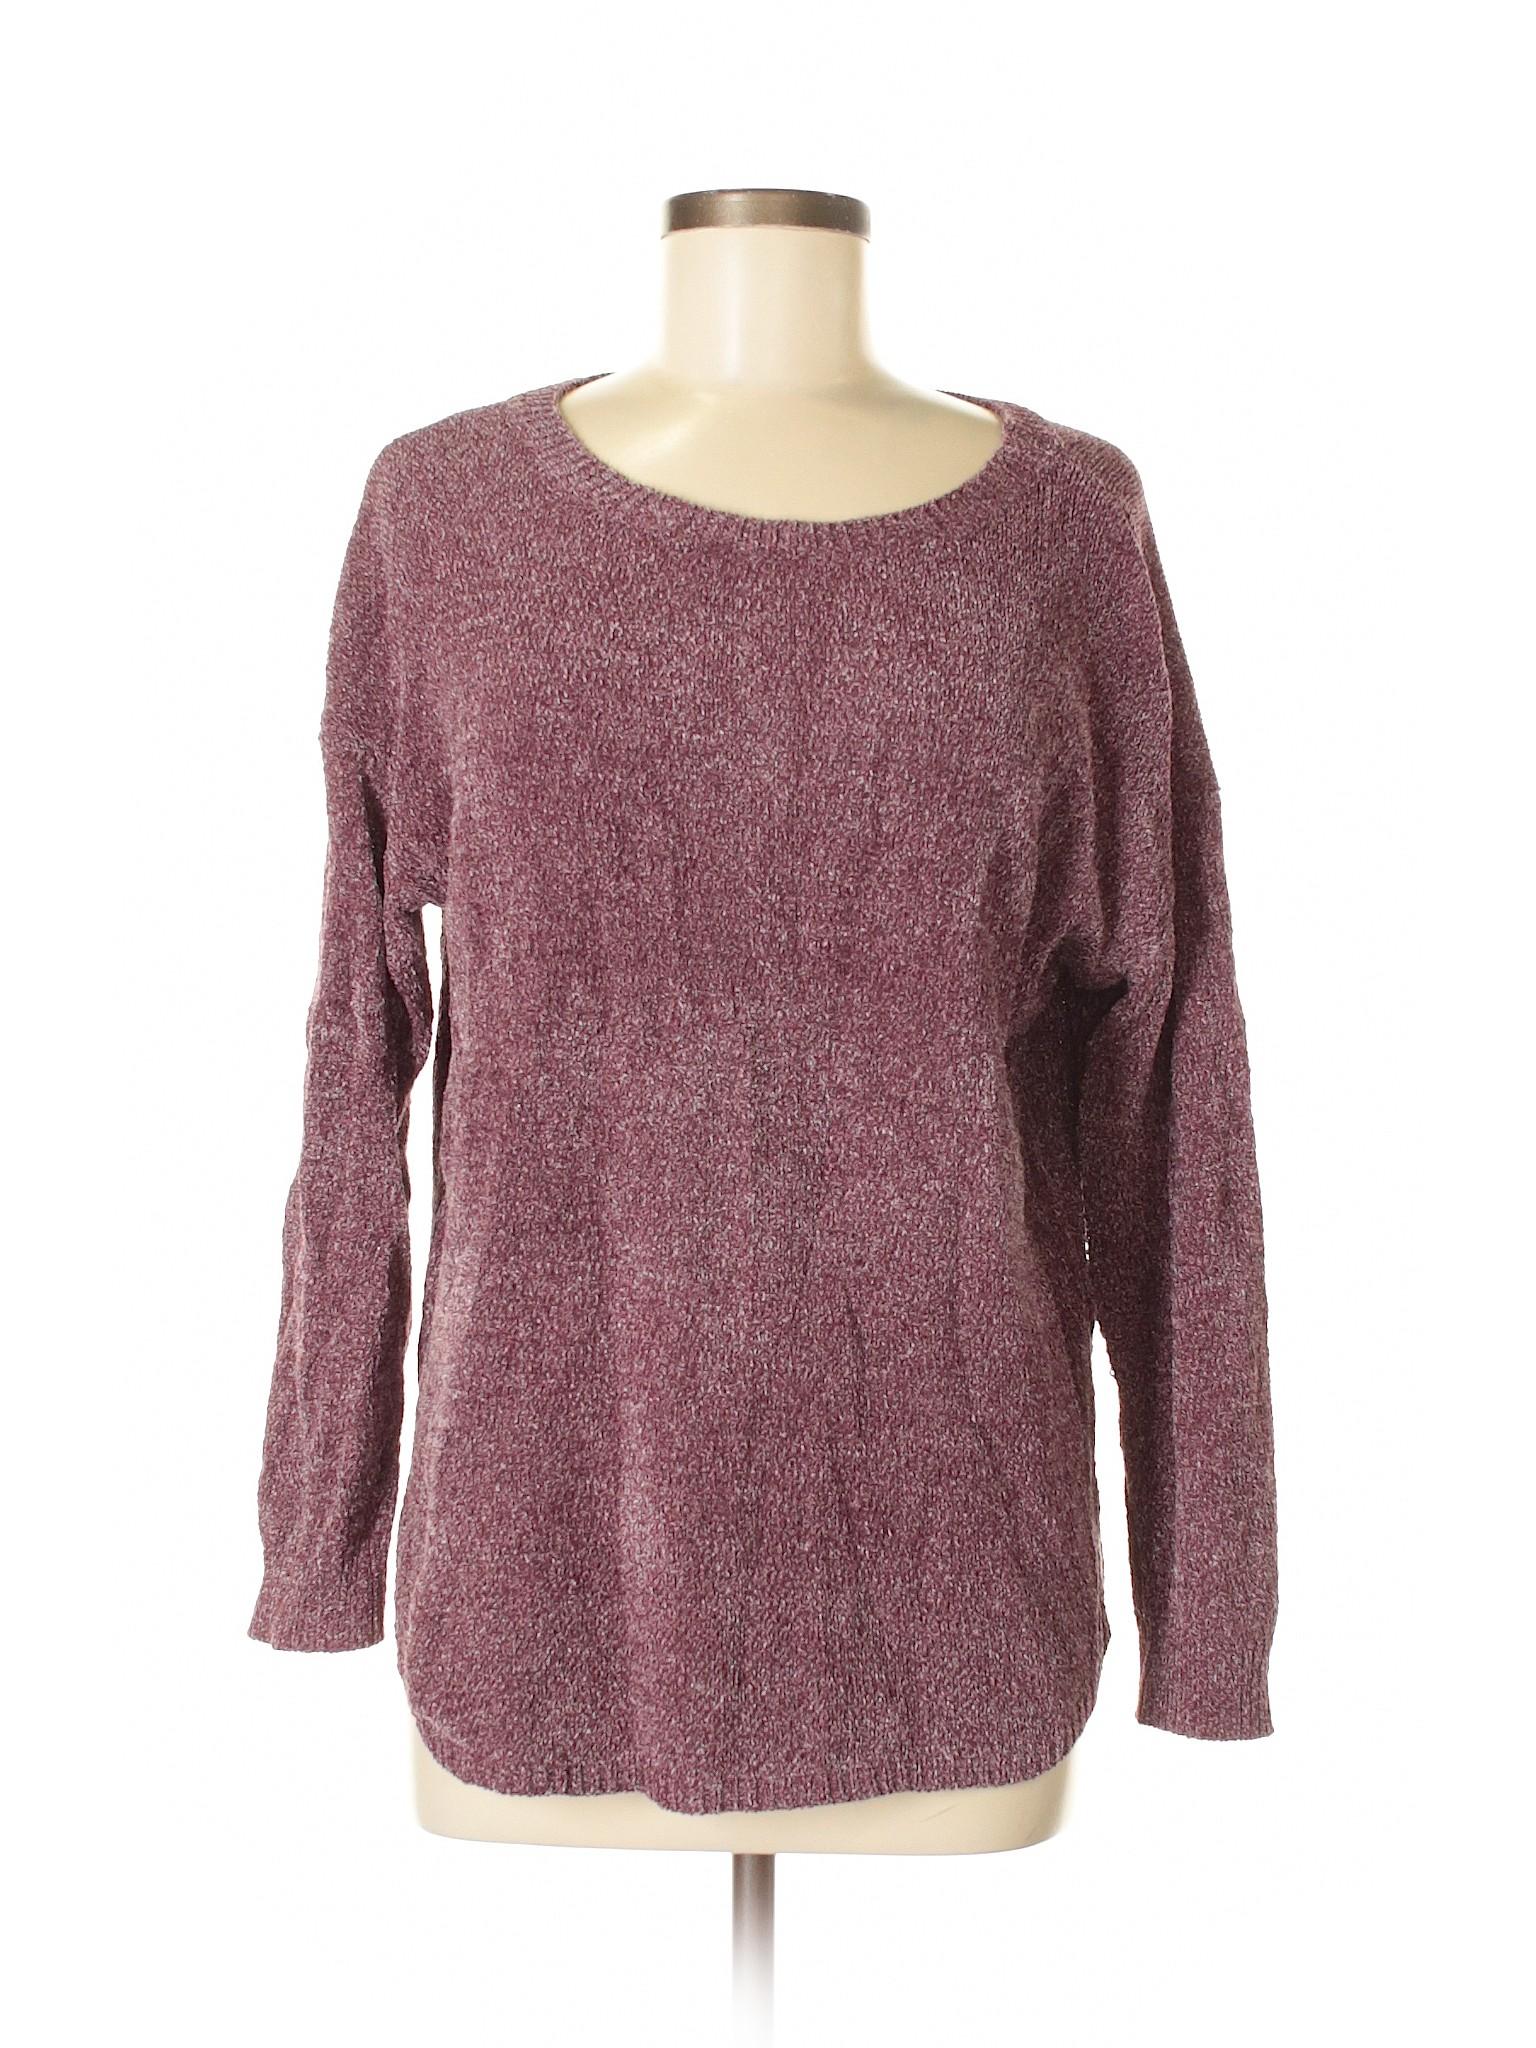 Sweater Ellen Pullover Tracy Boutique Pullover Sweater Ellen Tracy Boutique Ellen Boutique I4xax16